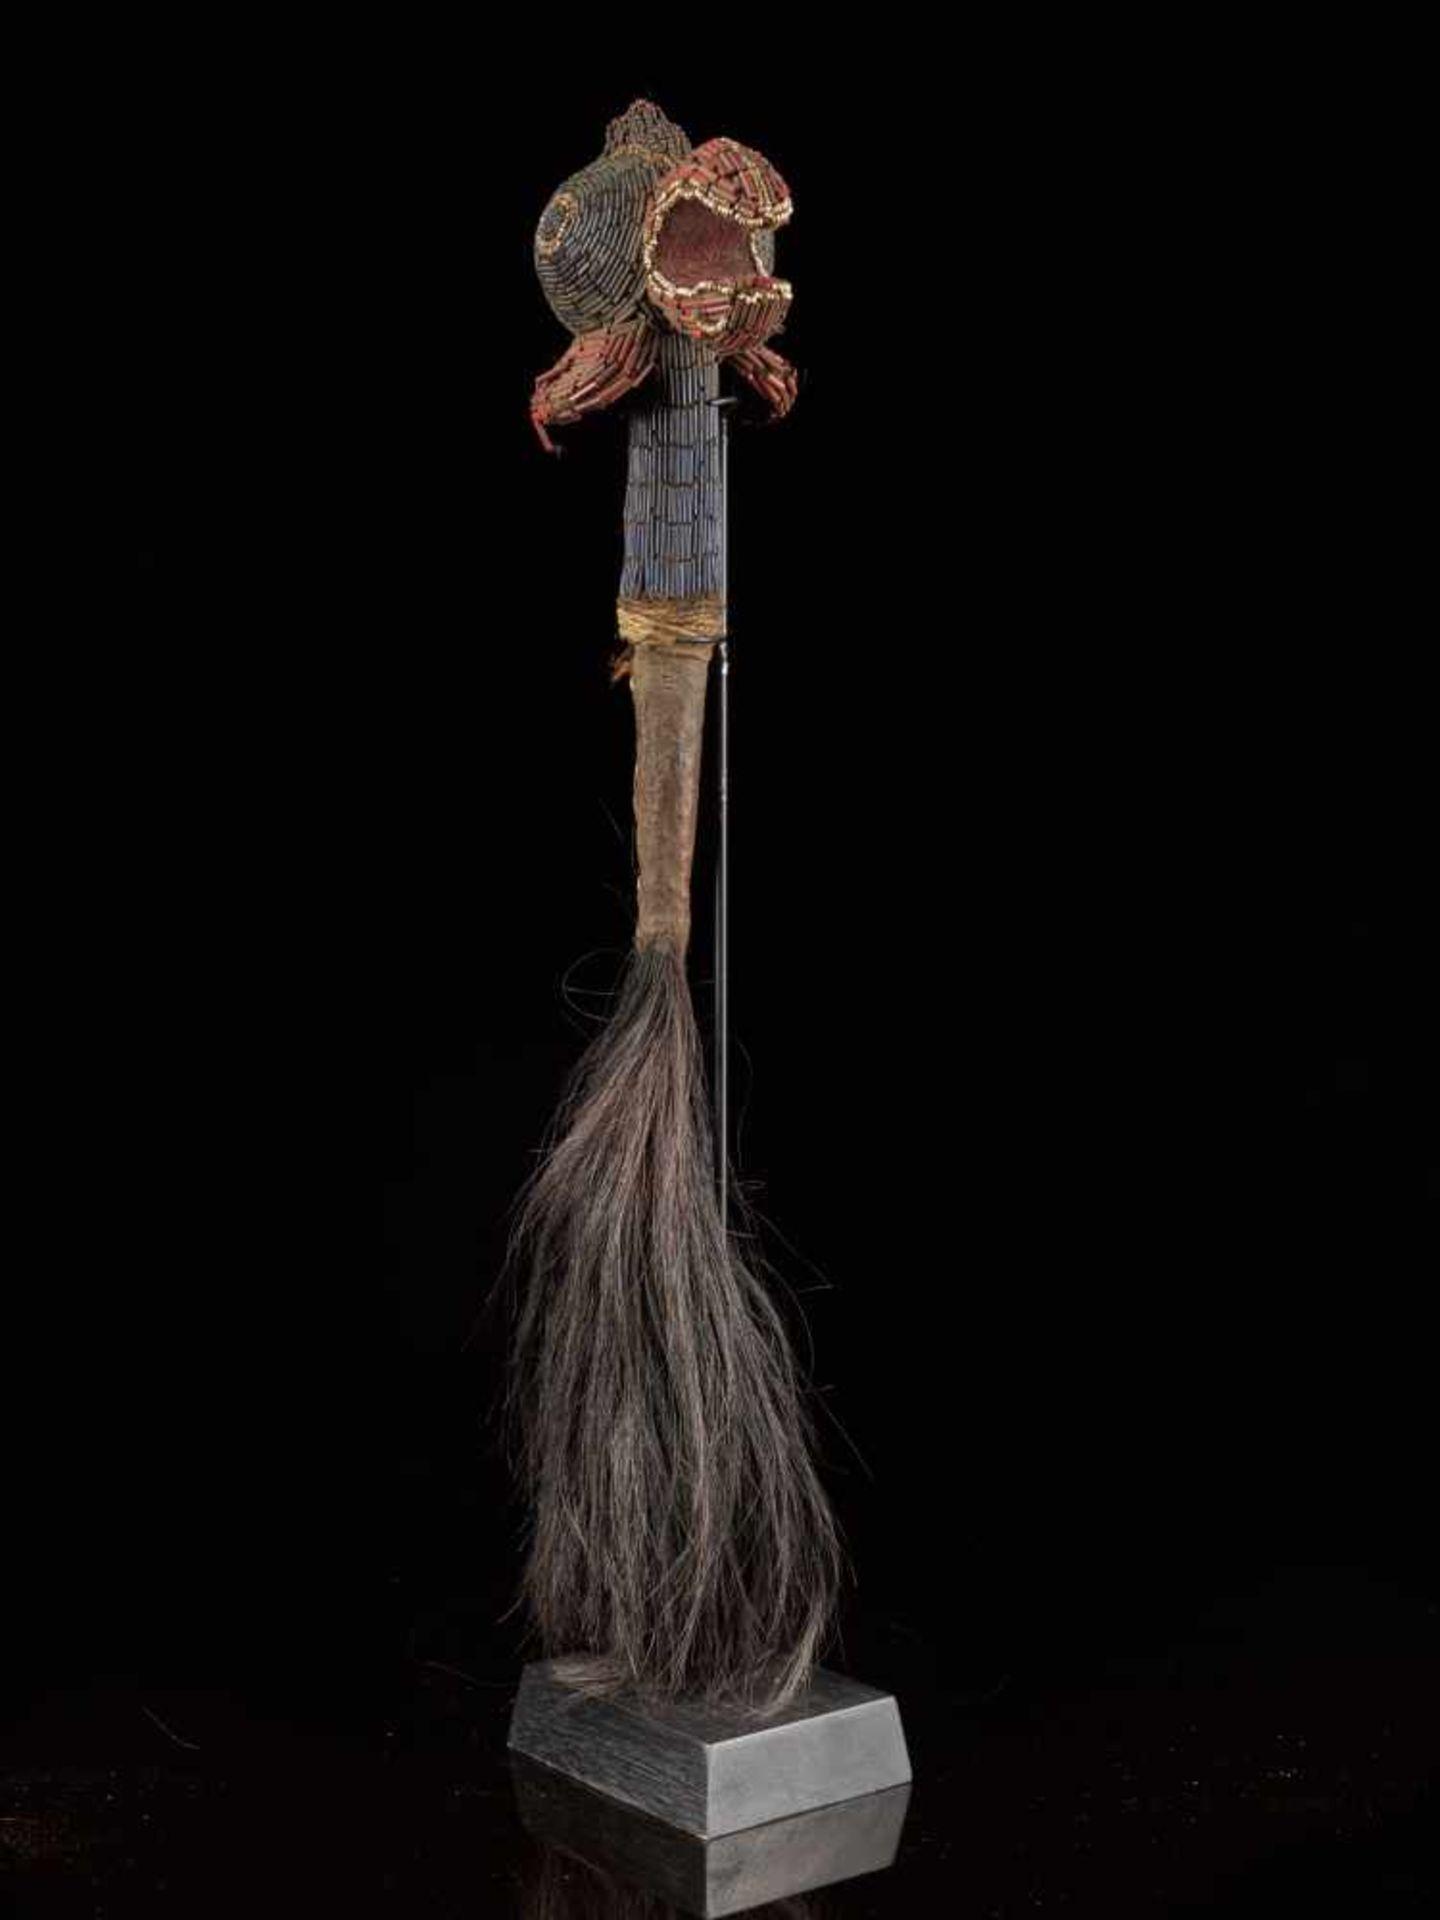 Beaded Flywhisk - Rooster - Tribal ArtThe Royal Fly Whisks (ethnic names: see leng koko or beuka) - Bild 2 aus 8